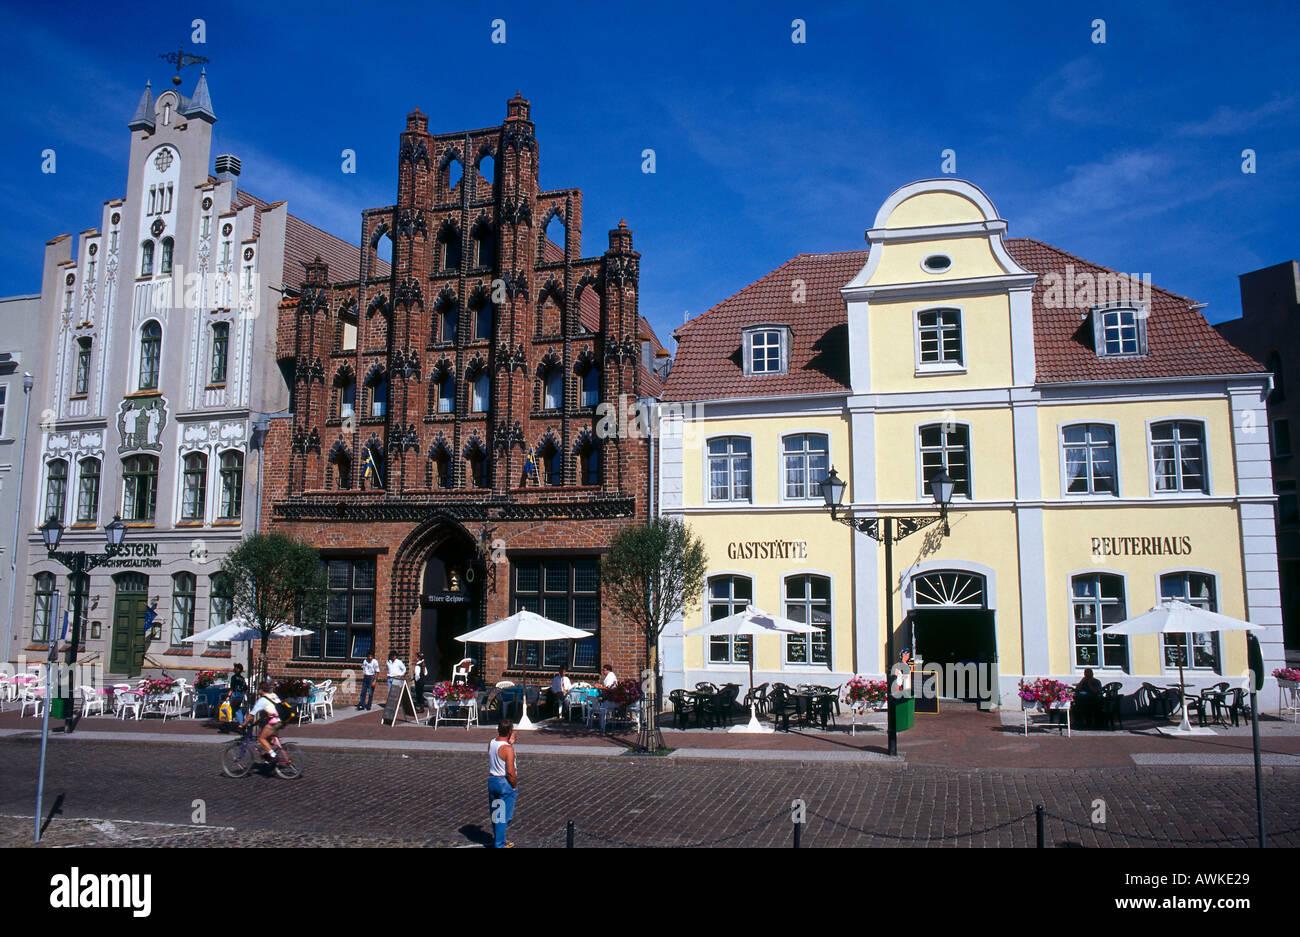 Facade of restaurant, Wismar, Baltic Sea, Mecklenburg-Vorpommern, Germany - Stock Image